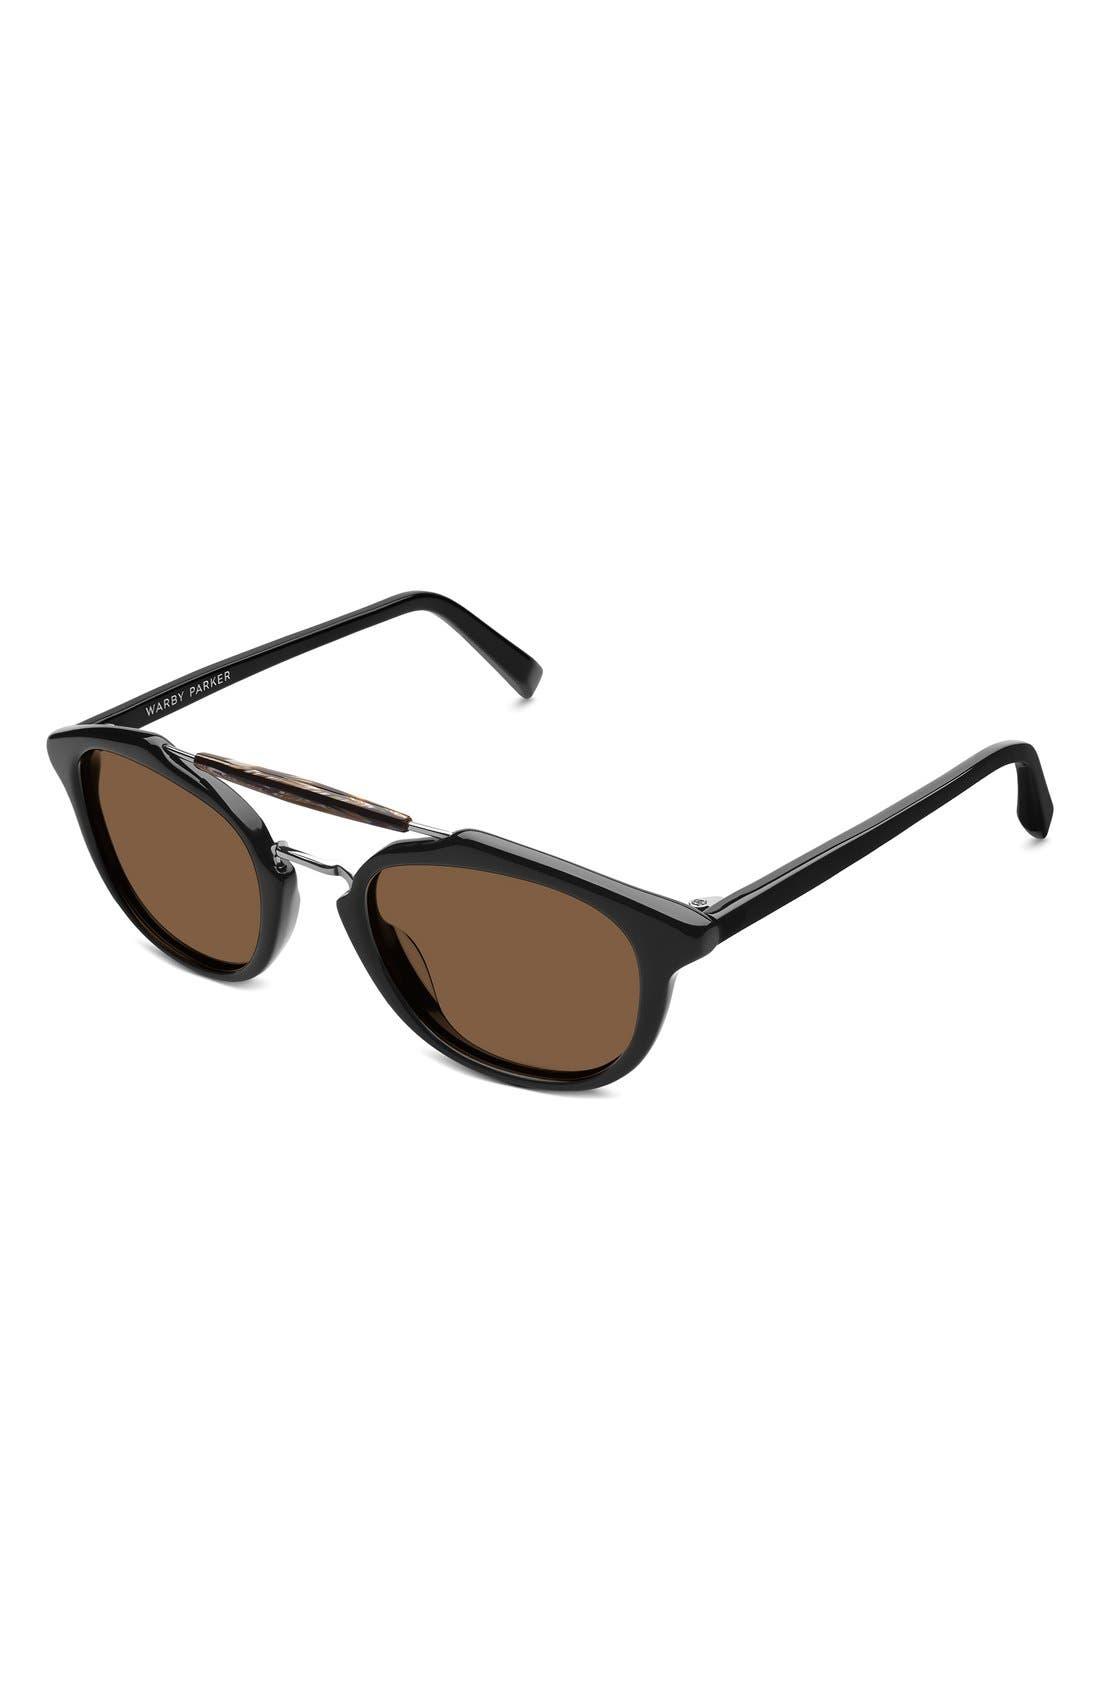 Alternate Image 2  - Warby Parker 'Teddy' 47mm Polarized Sunglasses